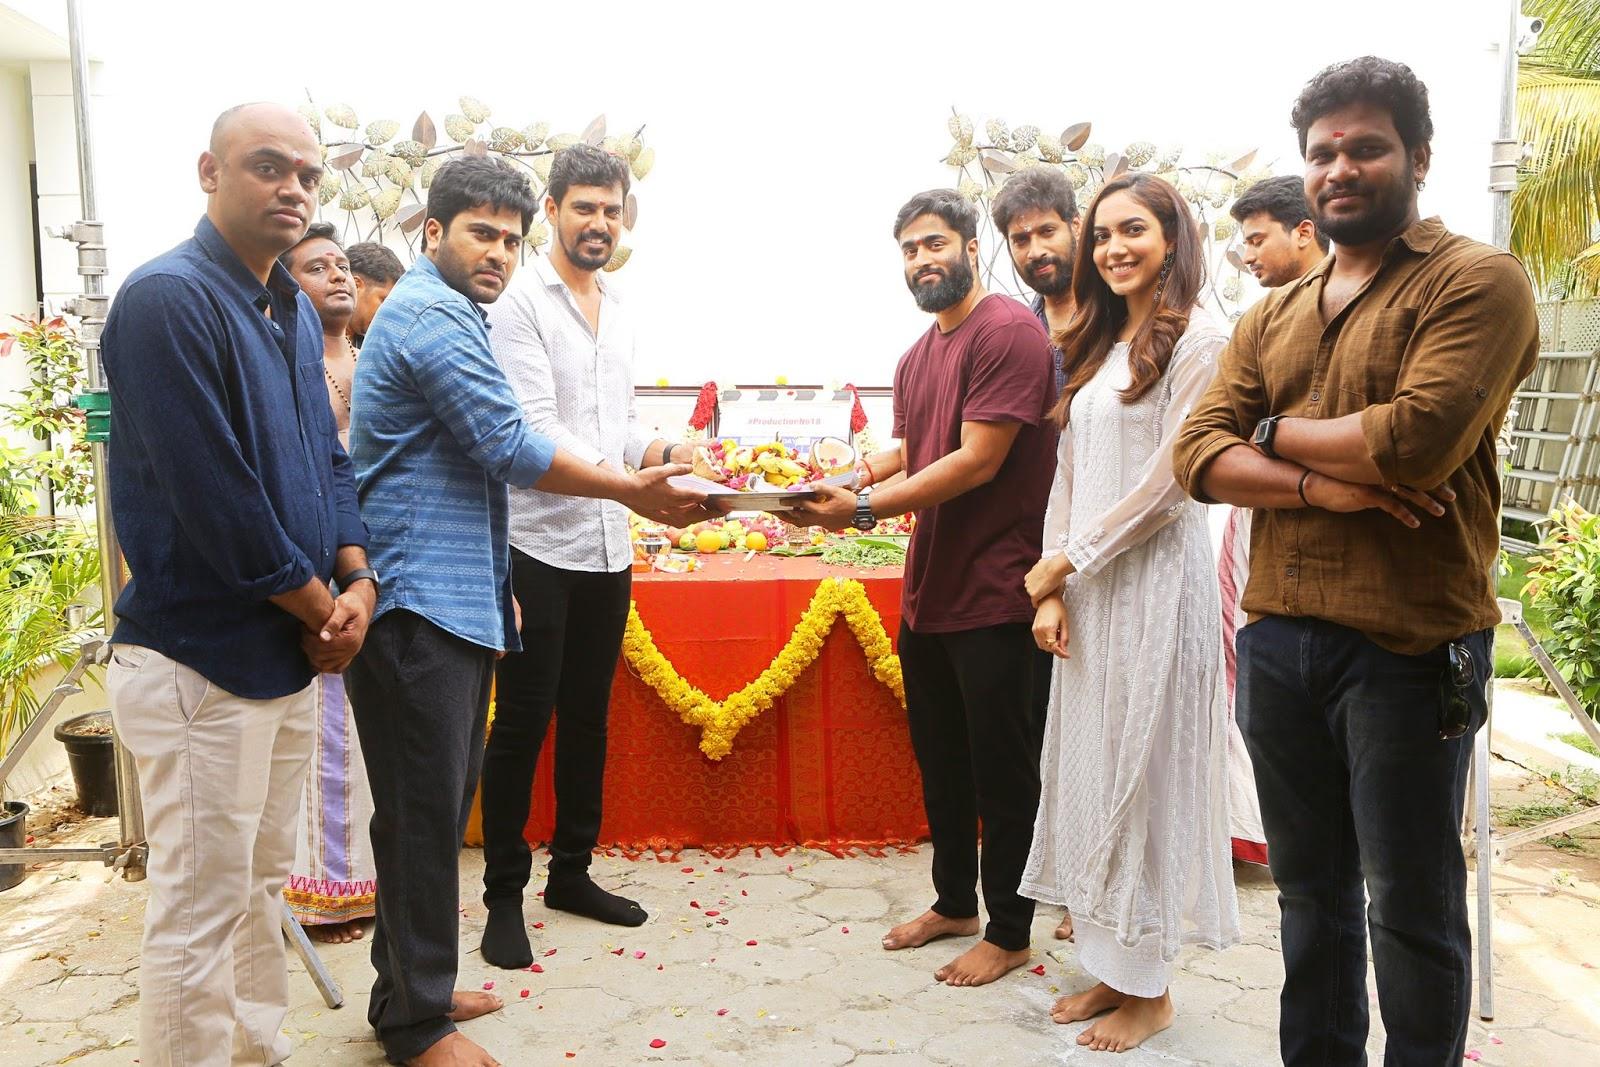 Sharwanand and Ritu Varma starrer Tamil-Telugu bilingual